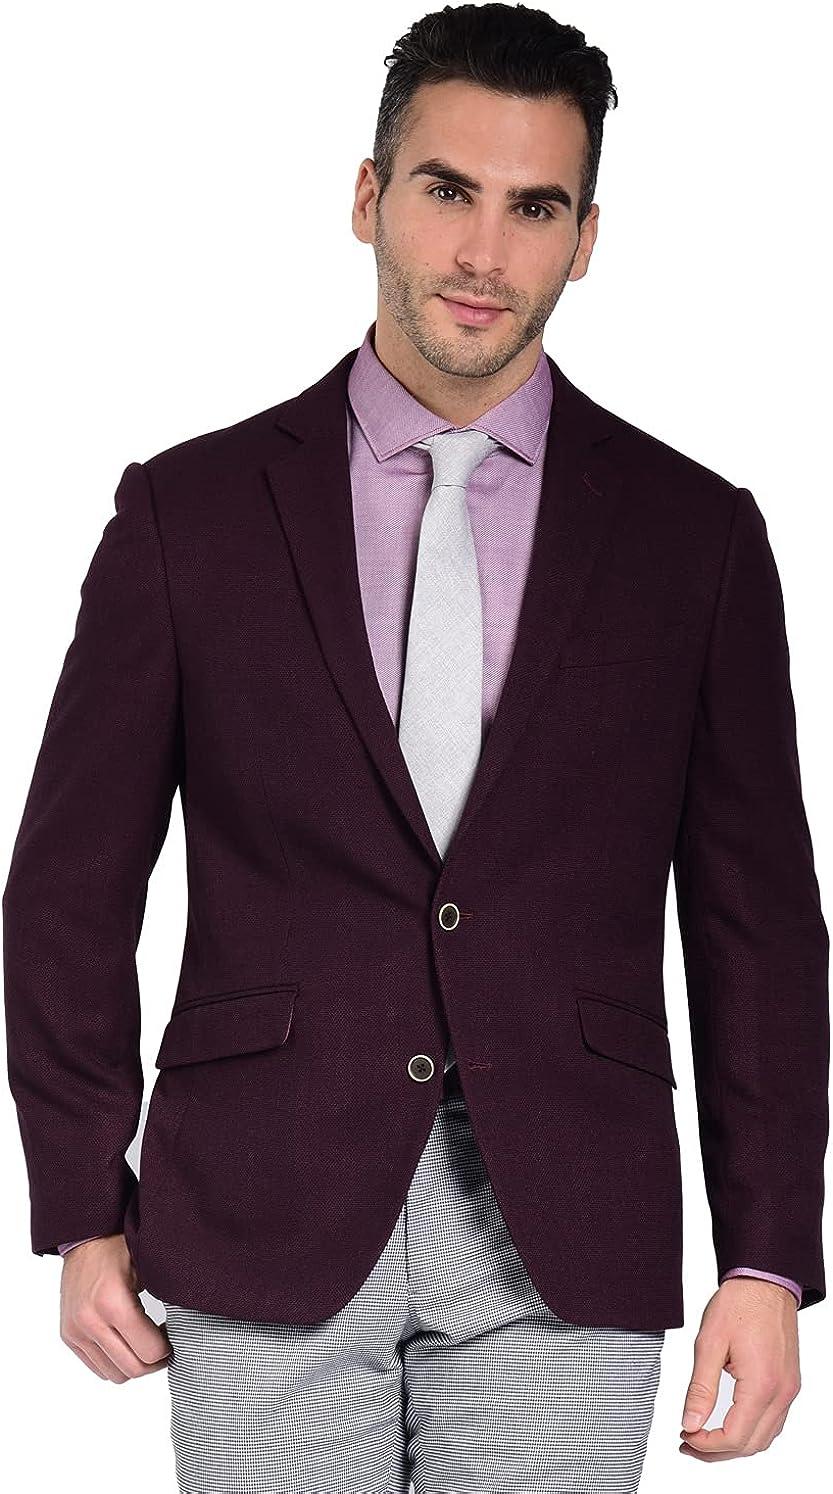 Craft & Soul Men's Slim Fit Stretch Textured Blazer Jacket Sport Coat